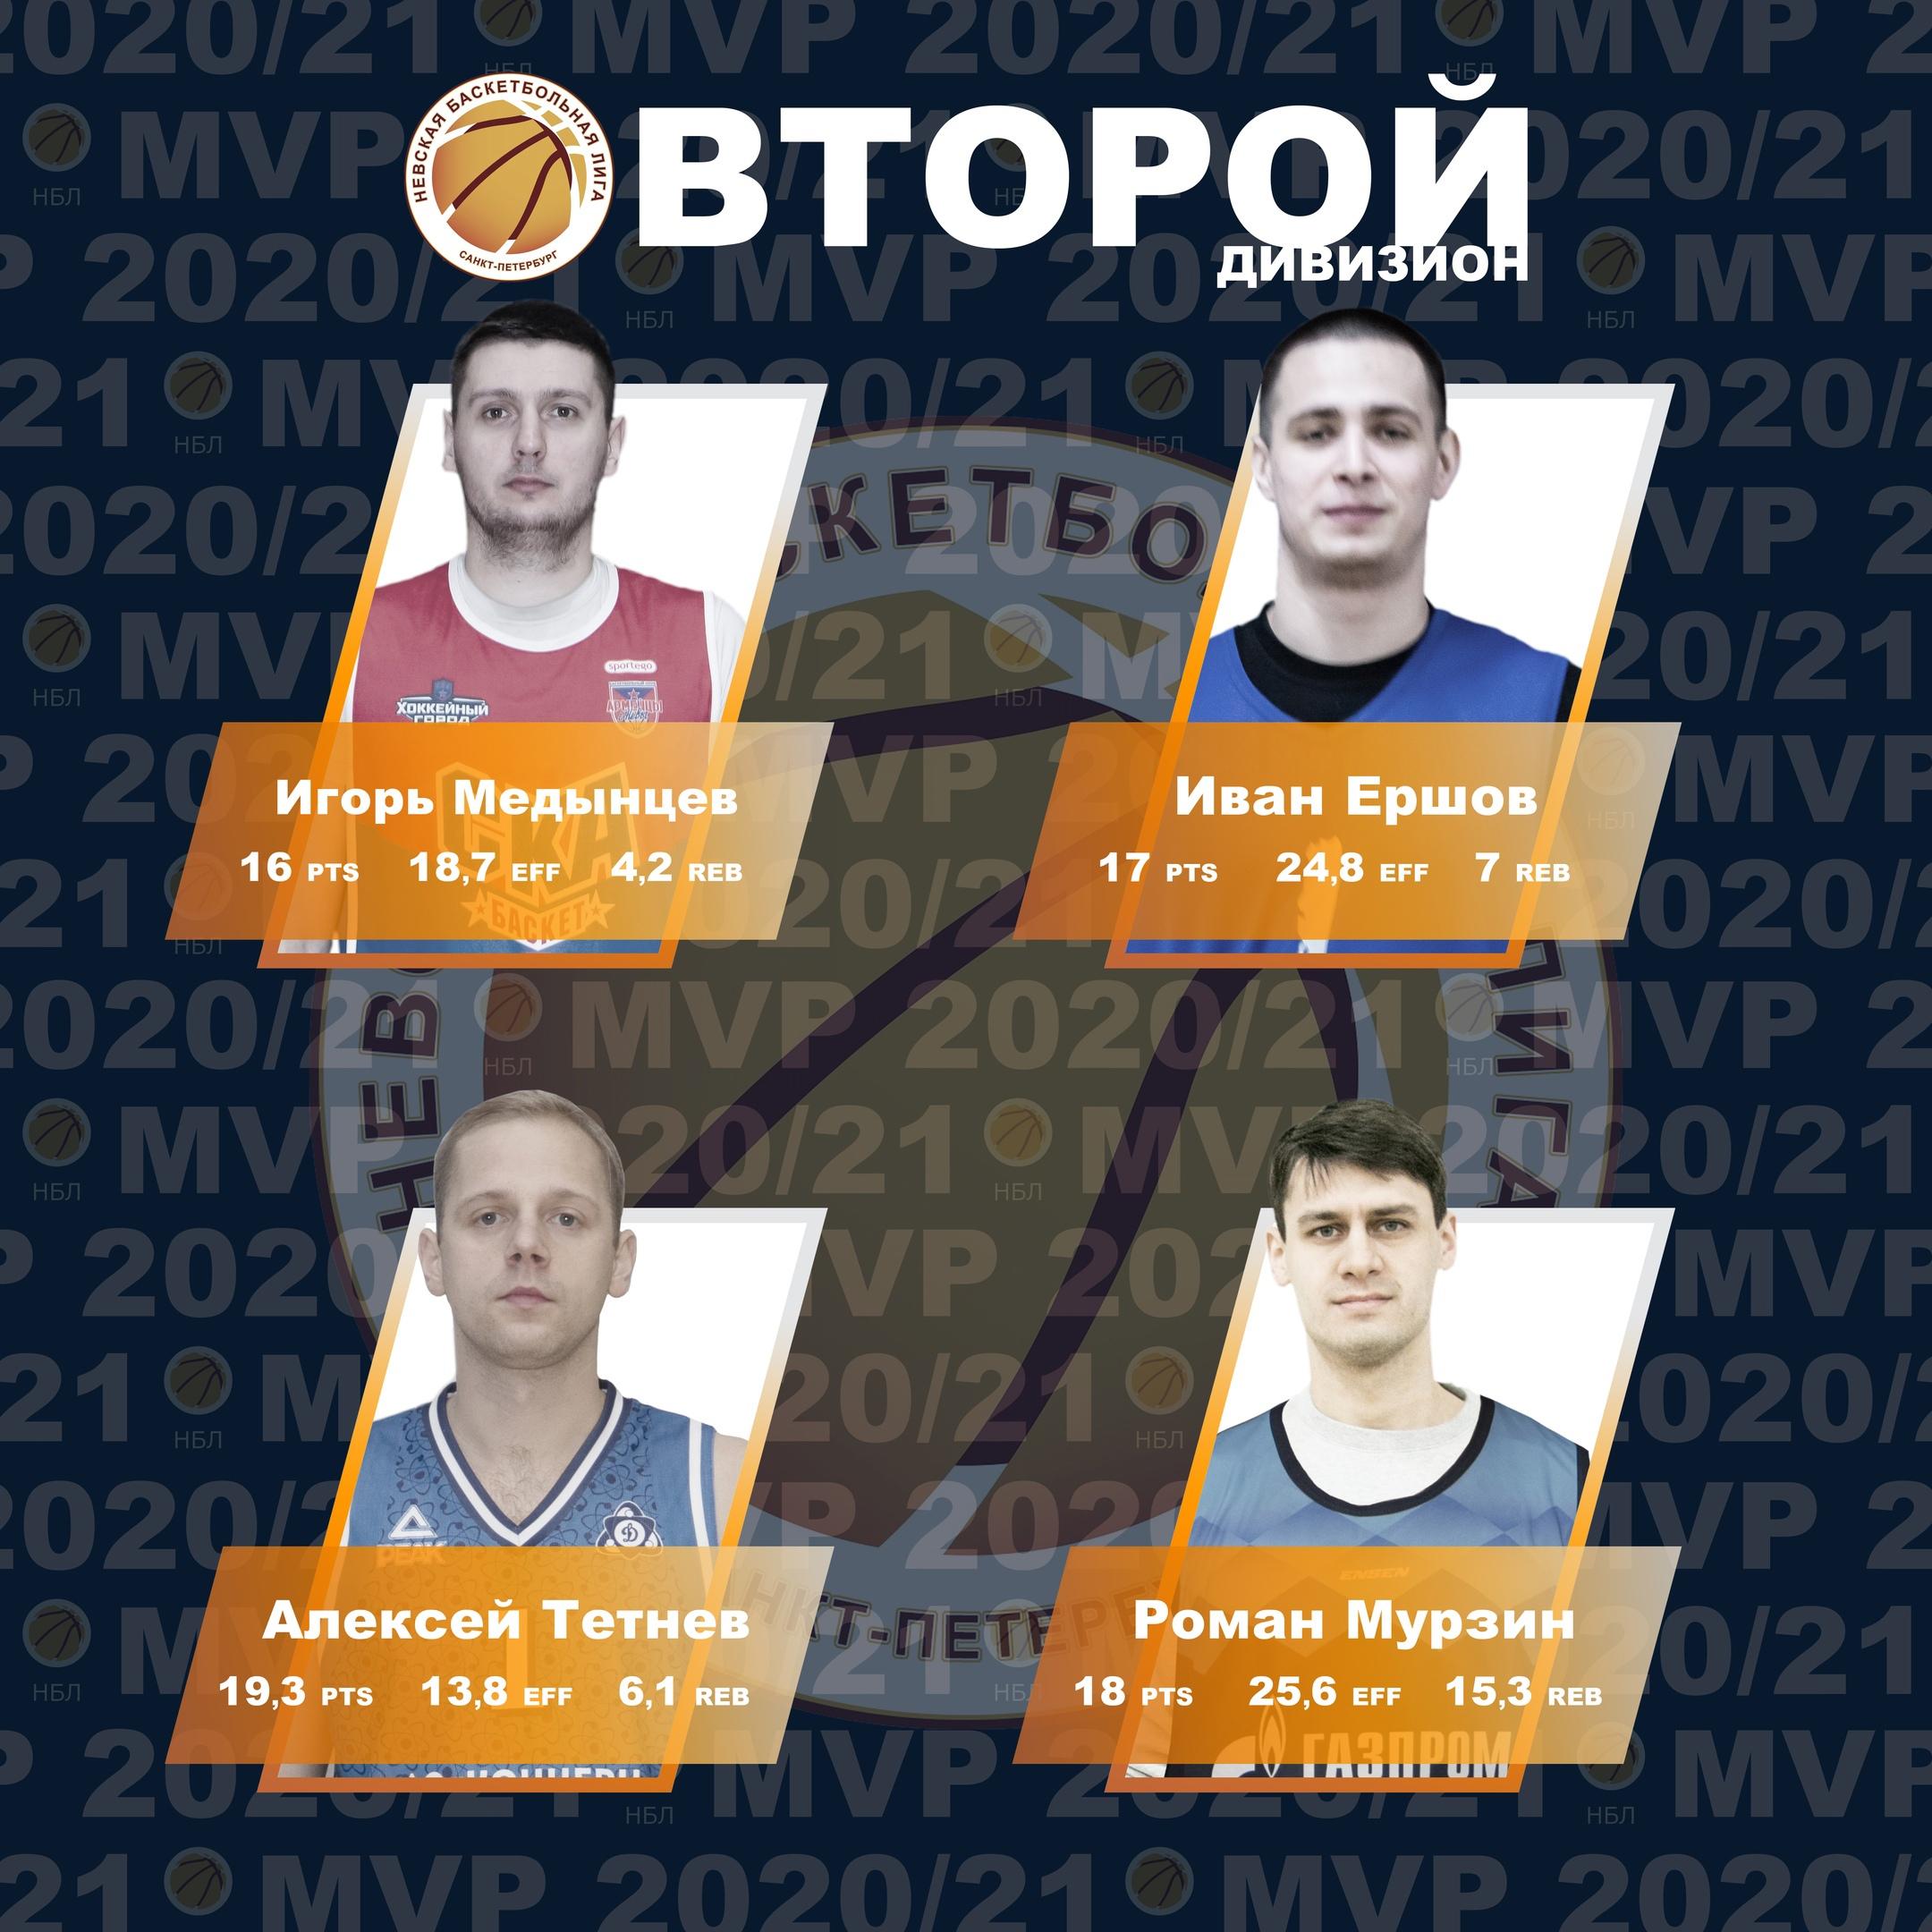 Номинанты MVP Второго Дивизиона